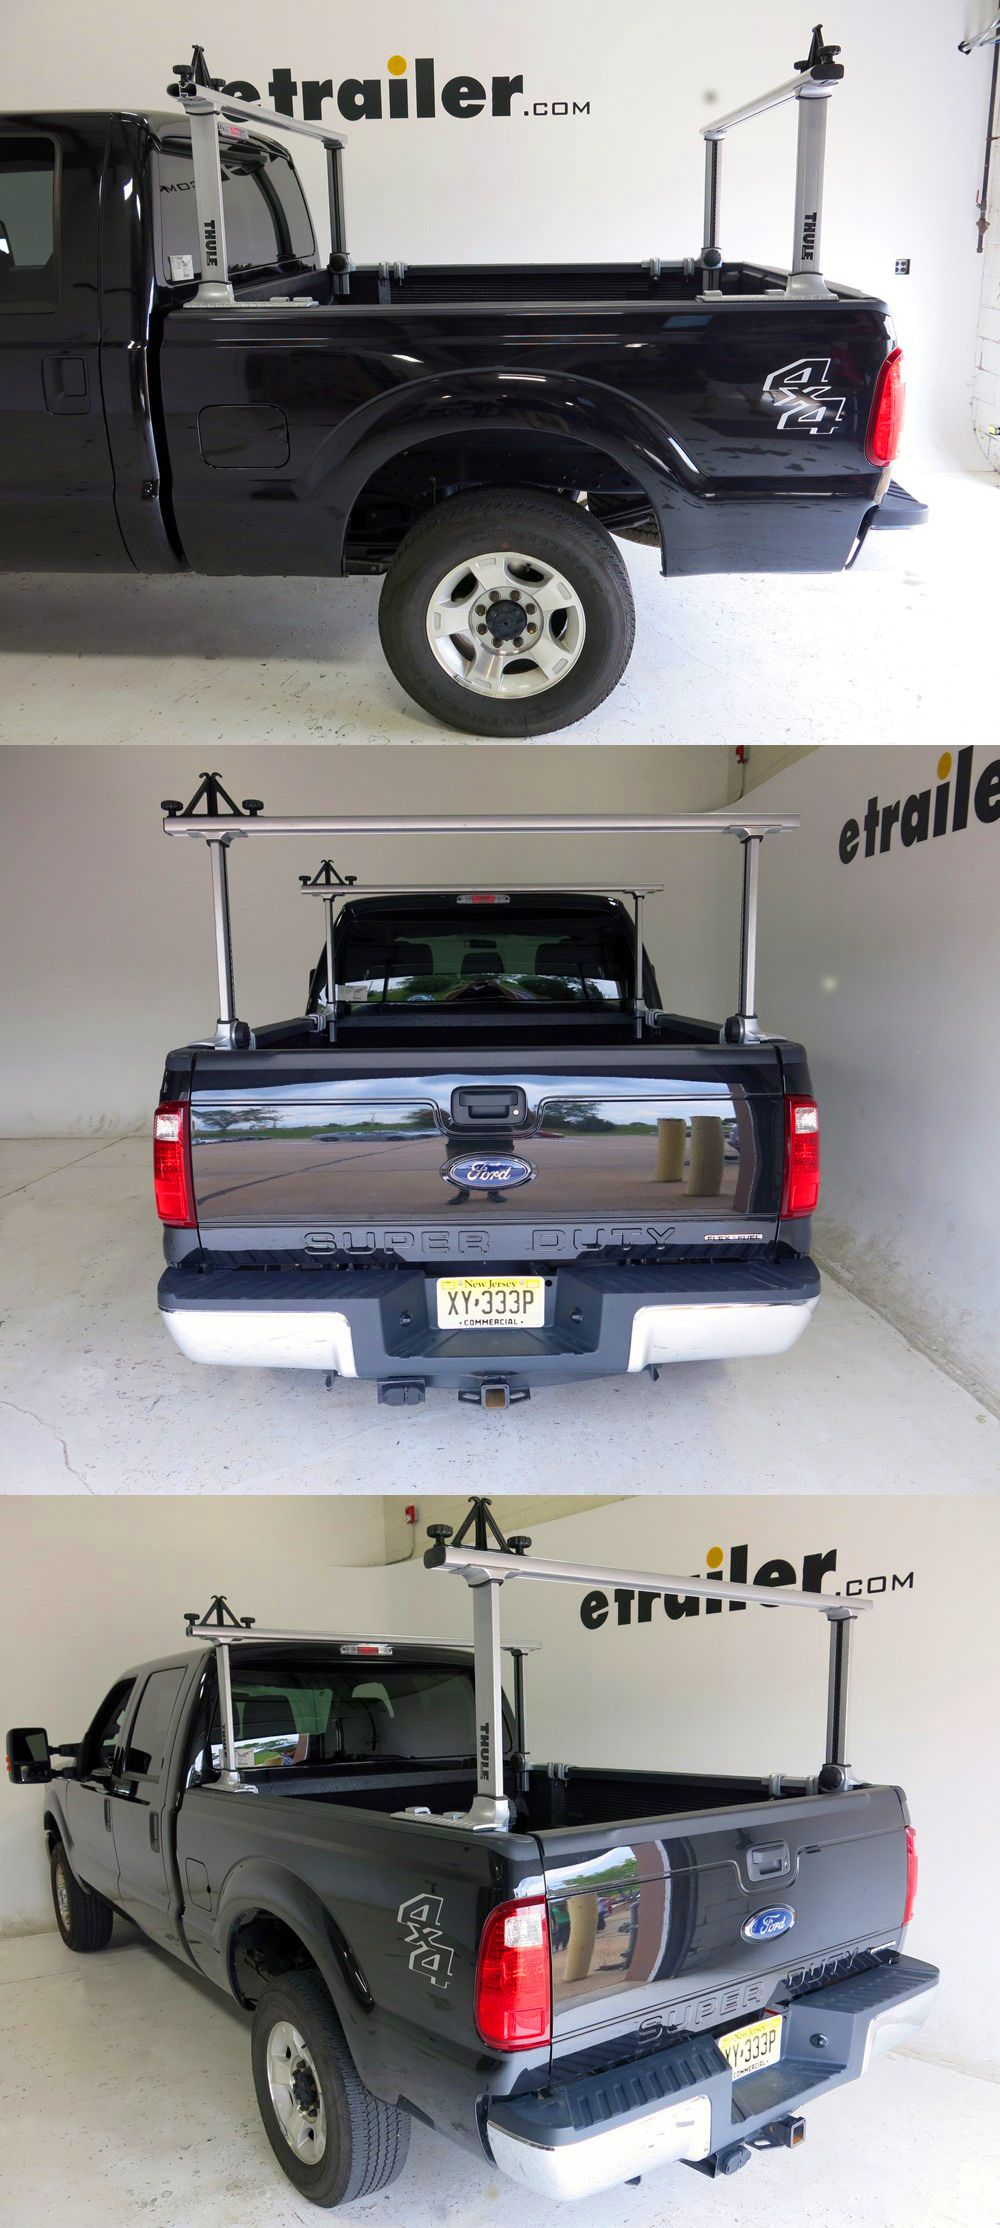 Thule xsporter pro adjustable height truck bed ladder rack aluminum 450 lbs thule ladder racks th500xt